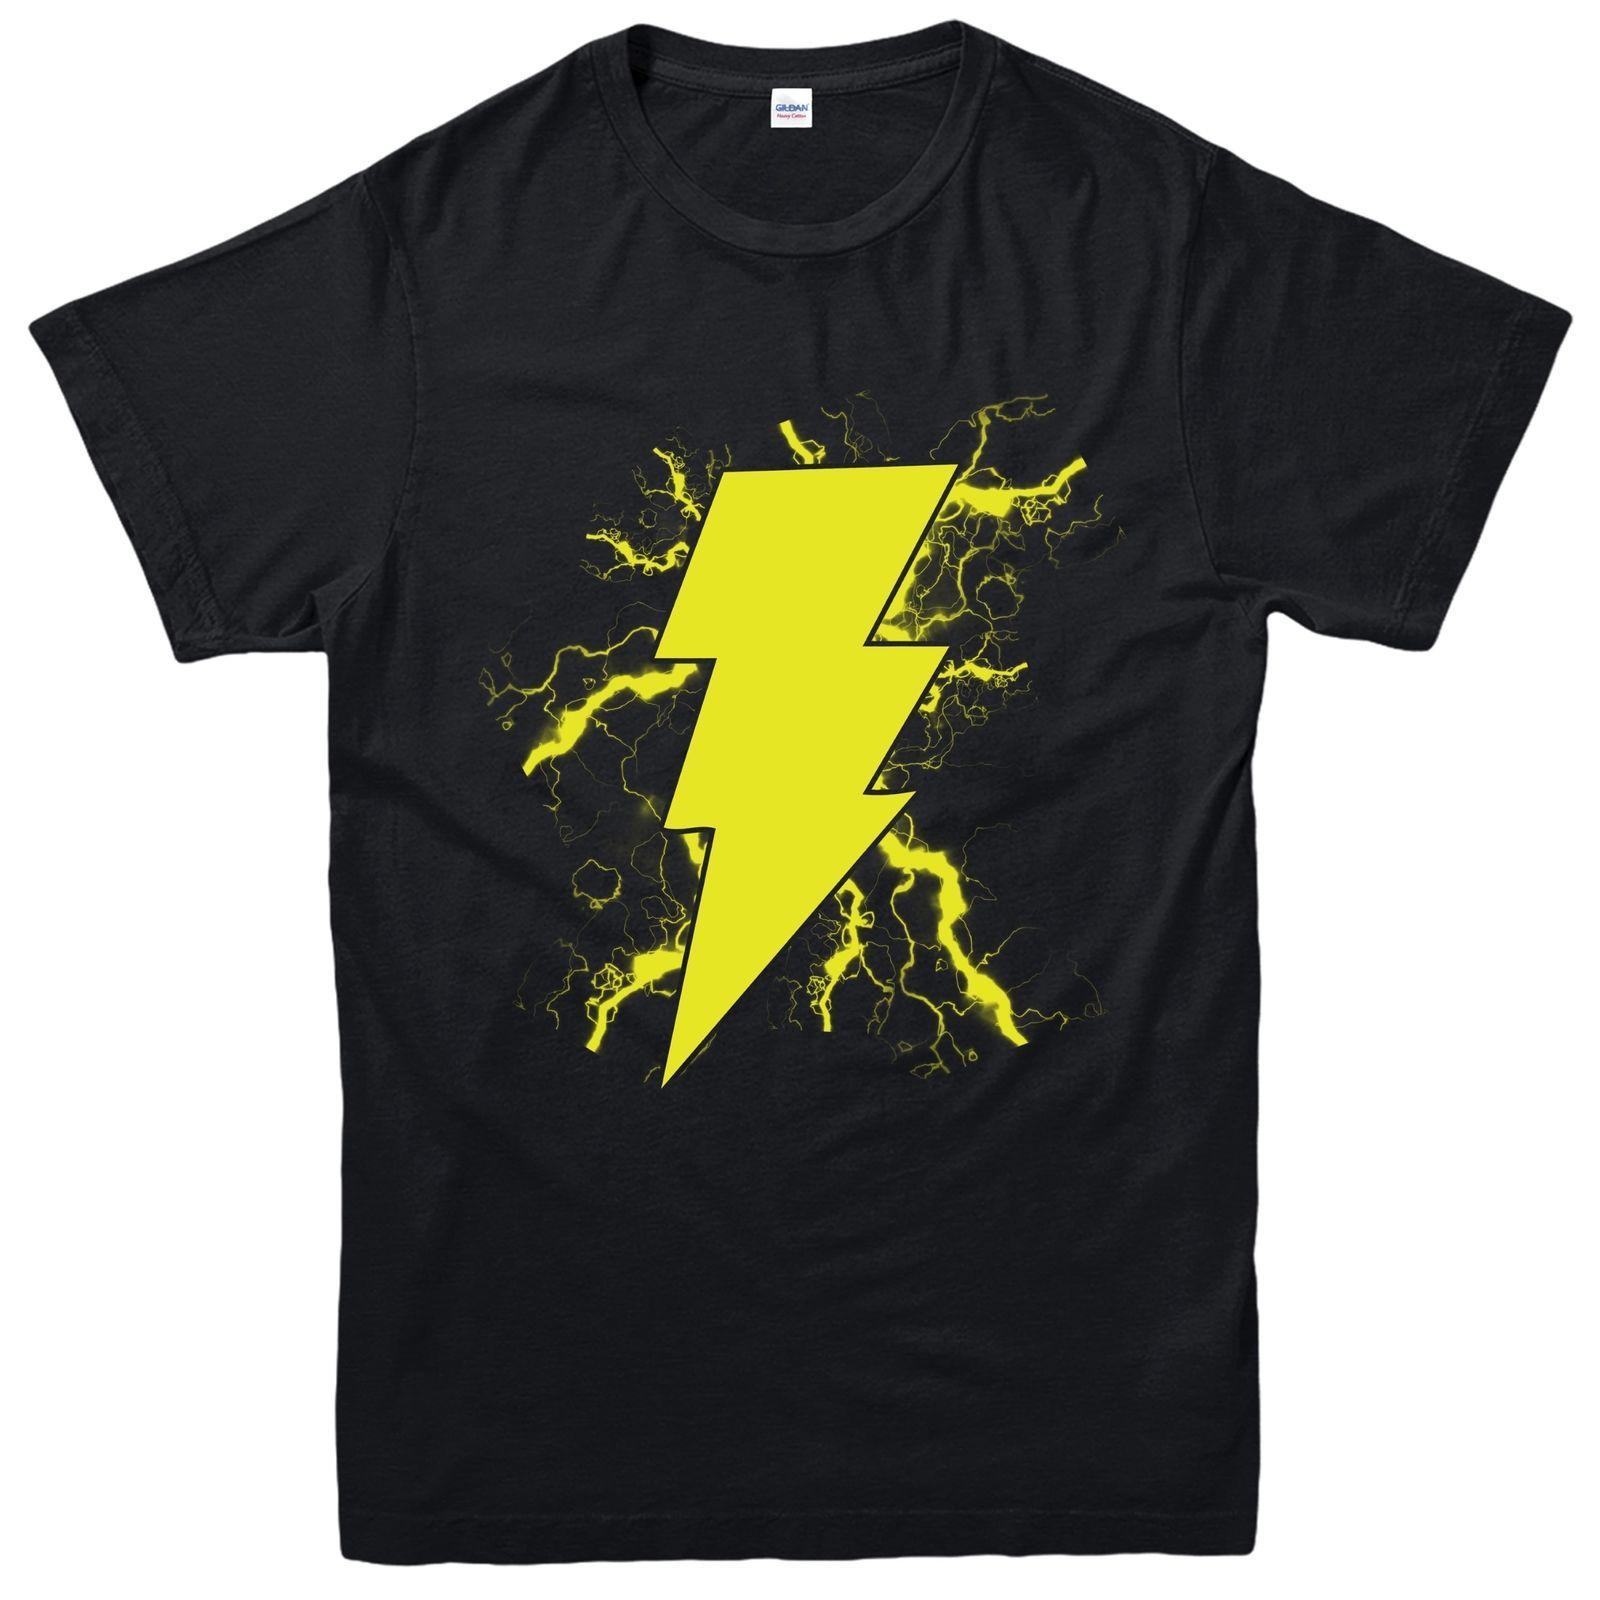 a8e08ad07 Shazam Thunder T Shirt, DC Comics Superhero Captain Marvel Inspired Tee Top  Cool T Shirt Sites White Designer T Shirts From Happytime89, $11.48|  DHgate.Com